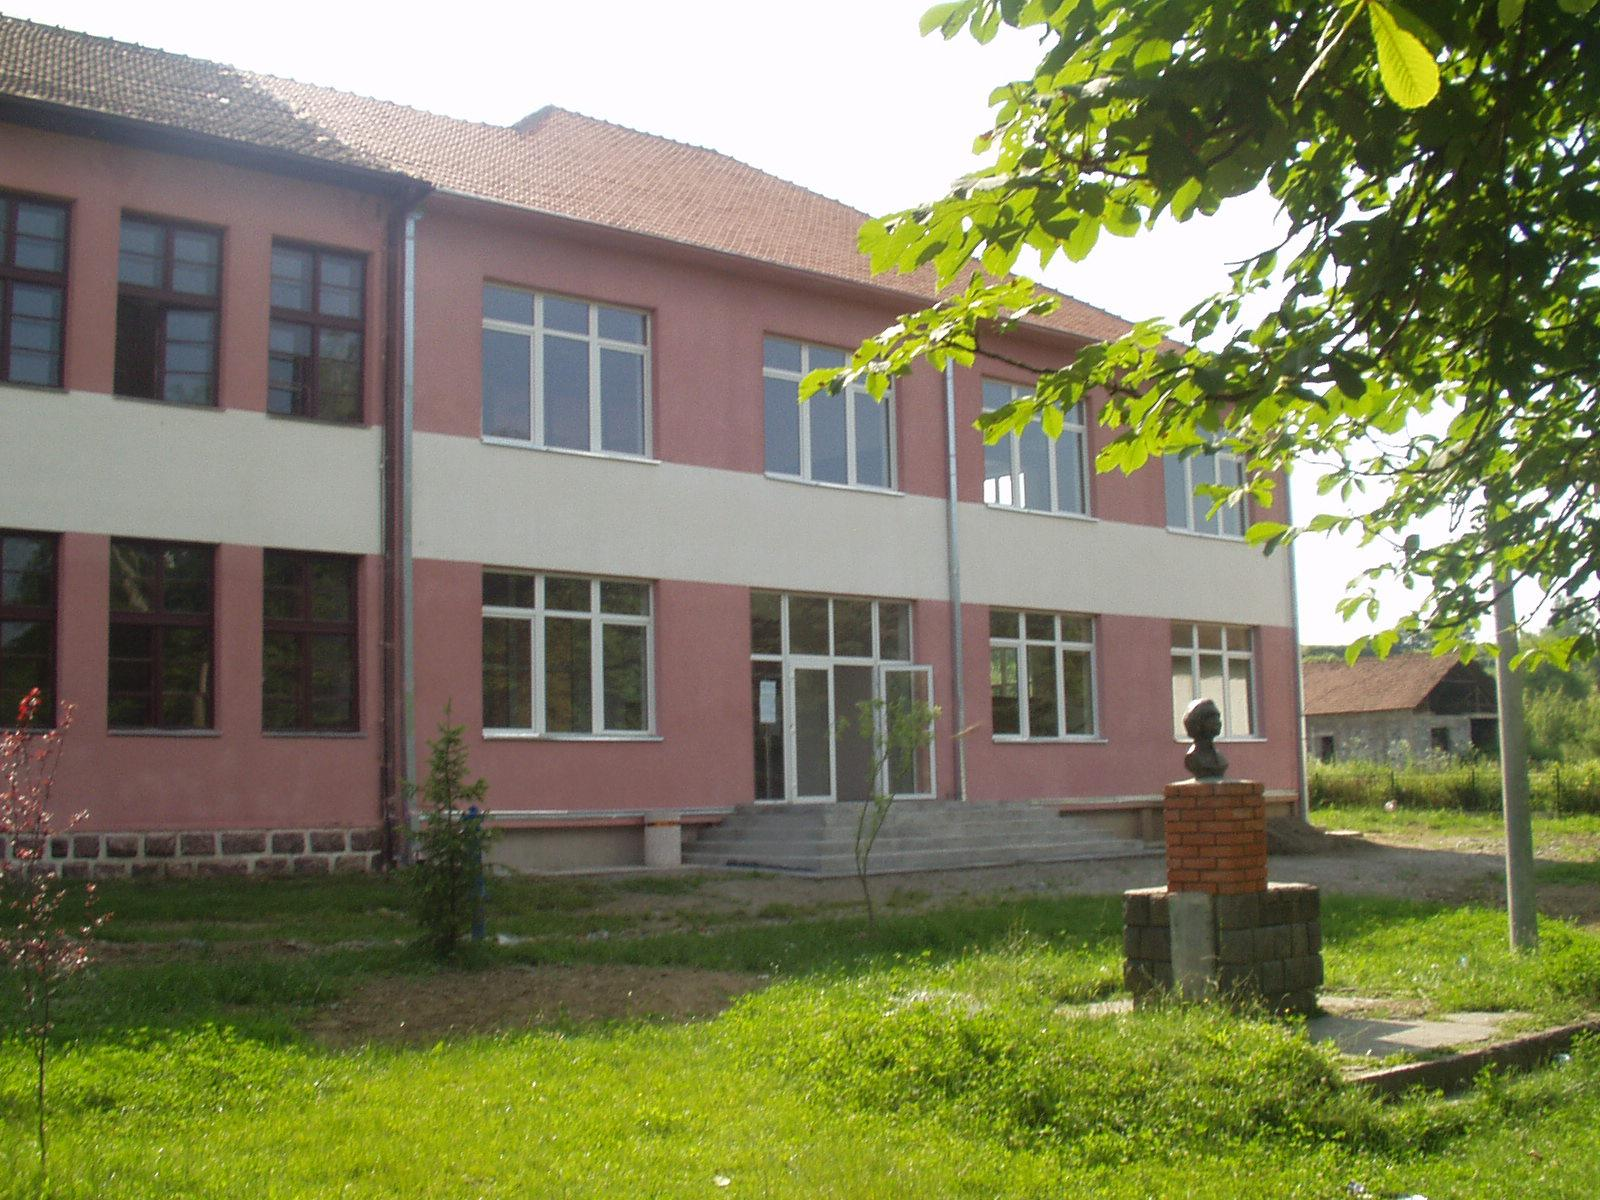 osnovna skola olga milutinovic godacica kraljevo slika skole